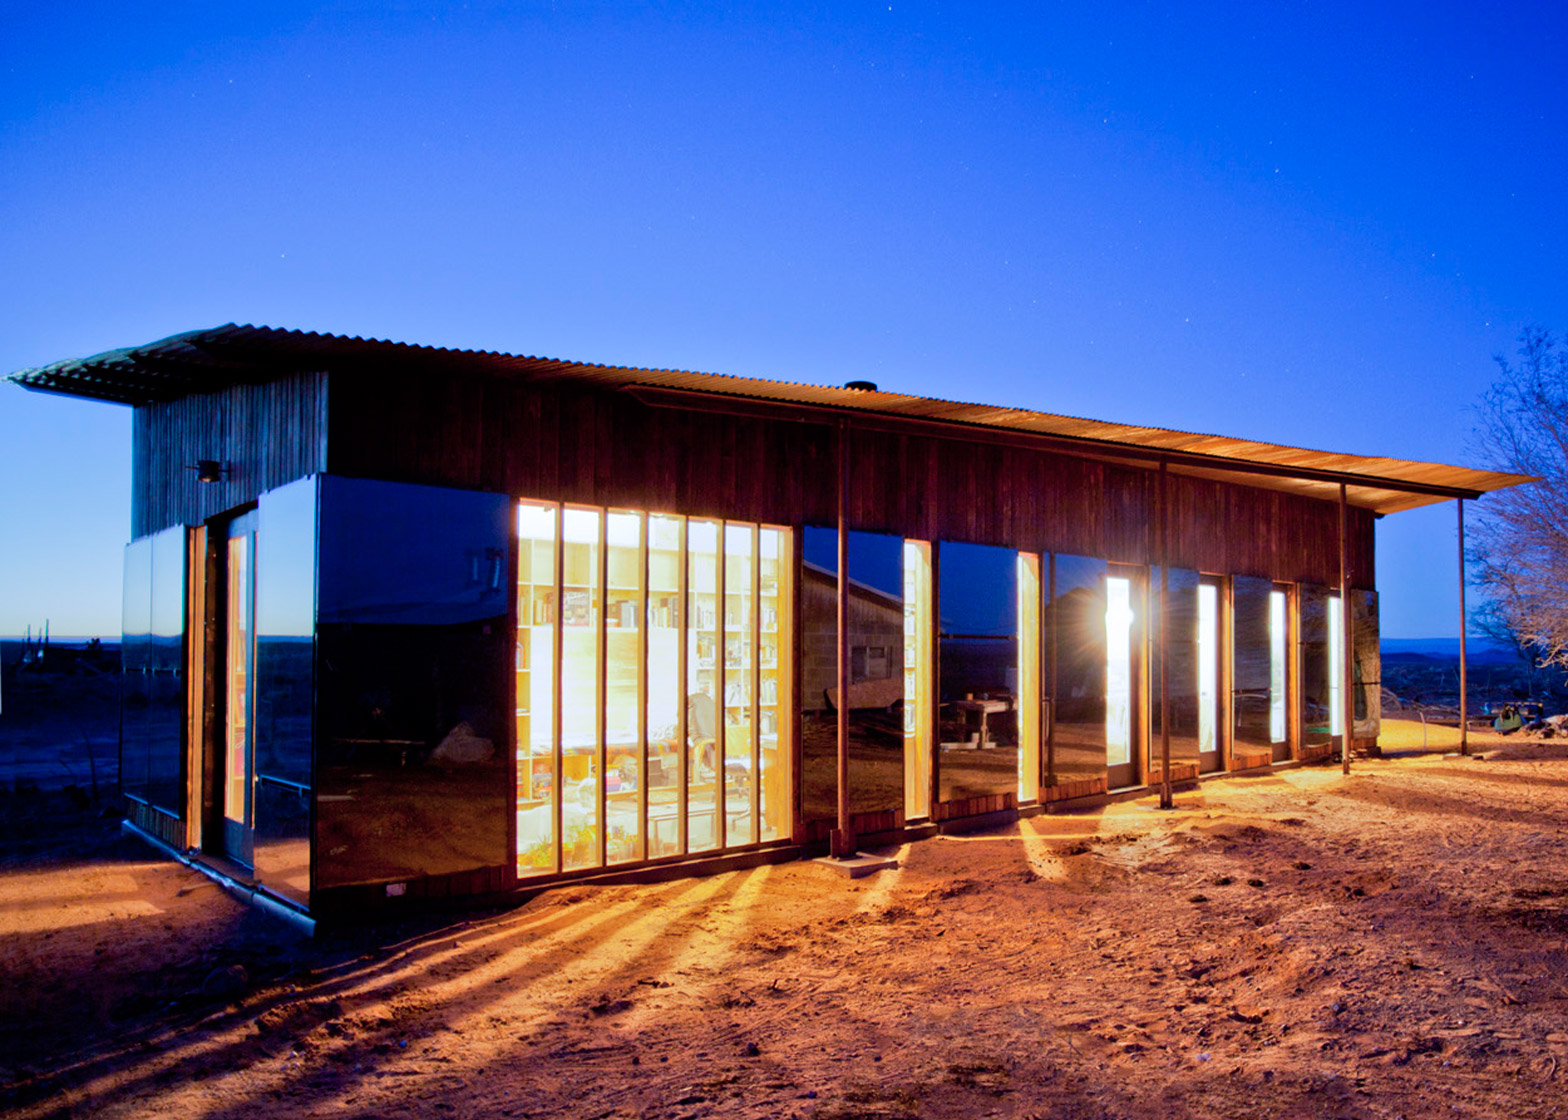 Nakai House by University of Colorado graduate students